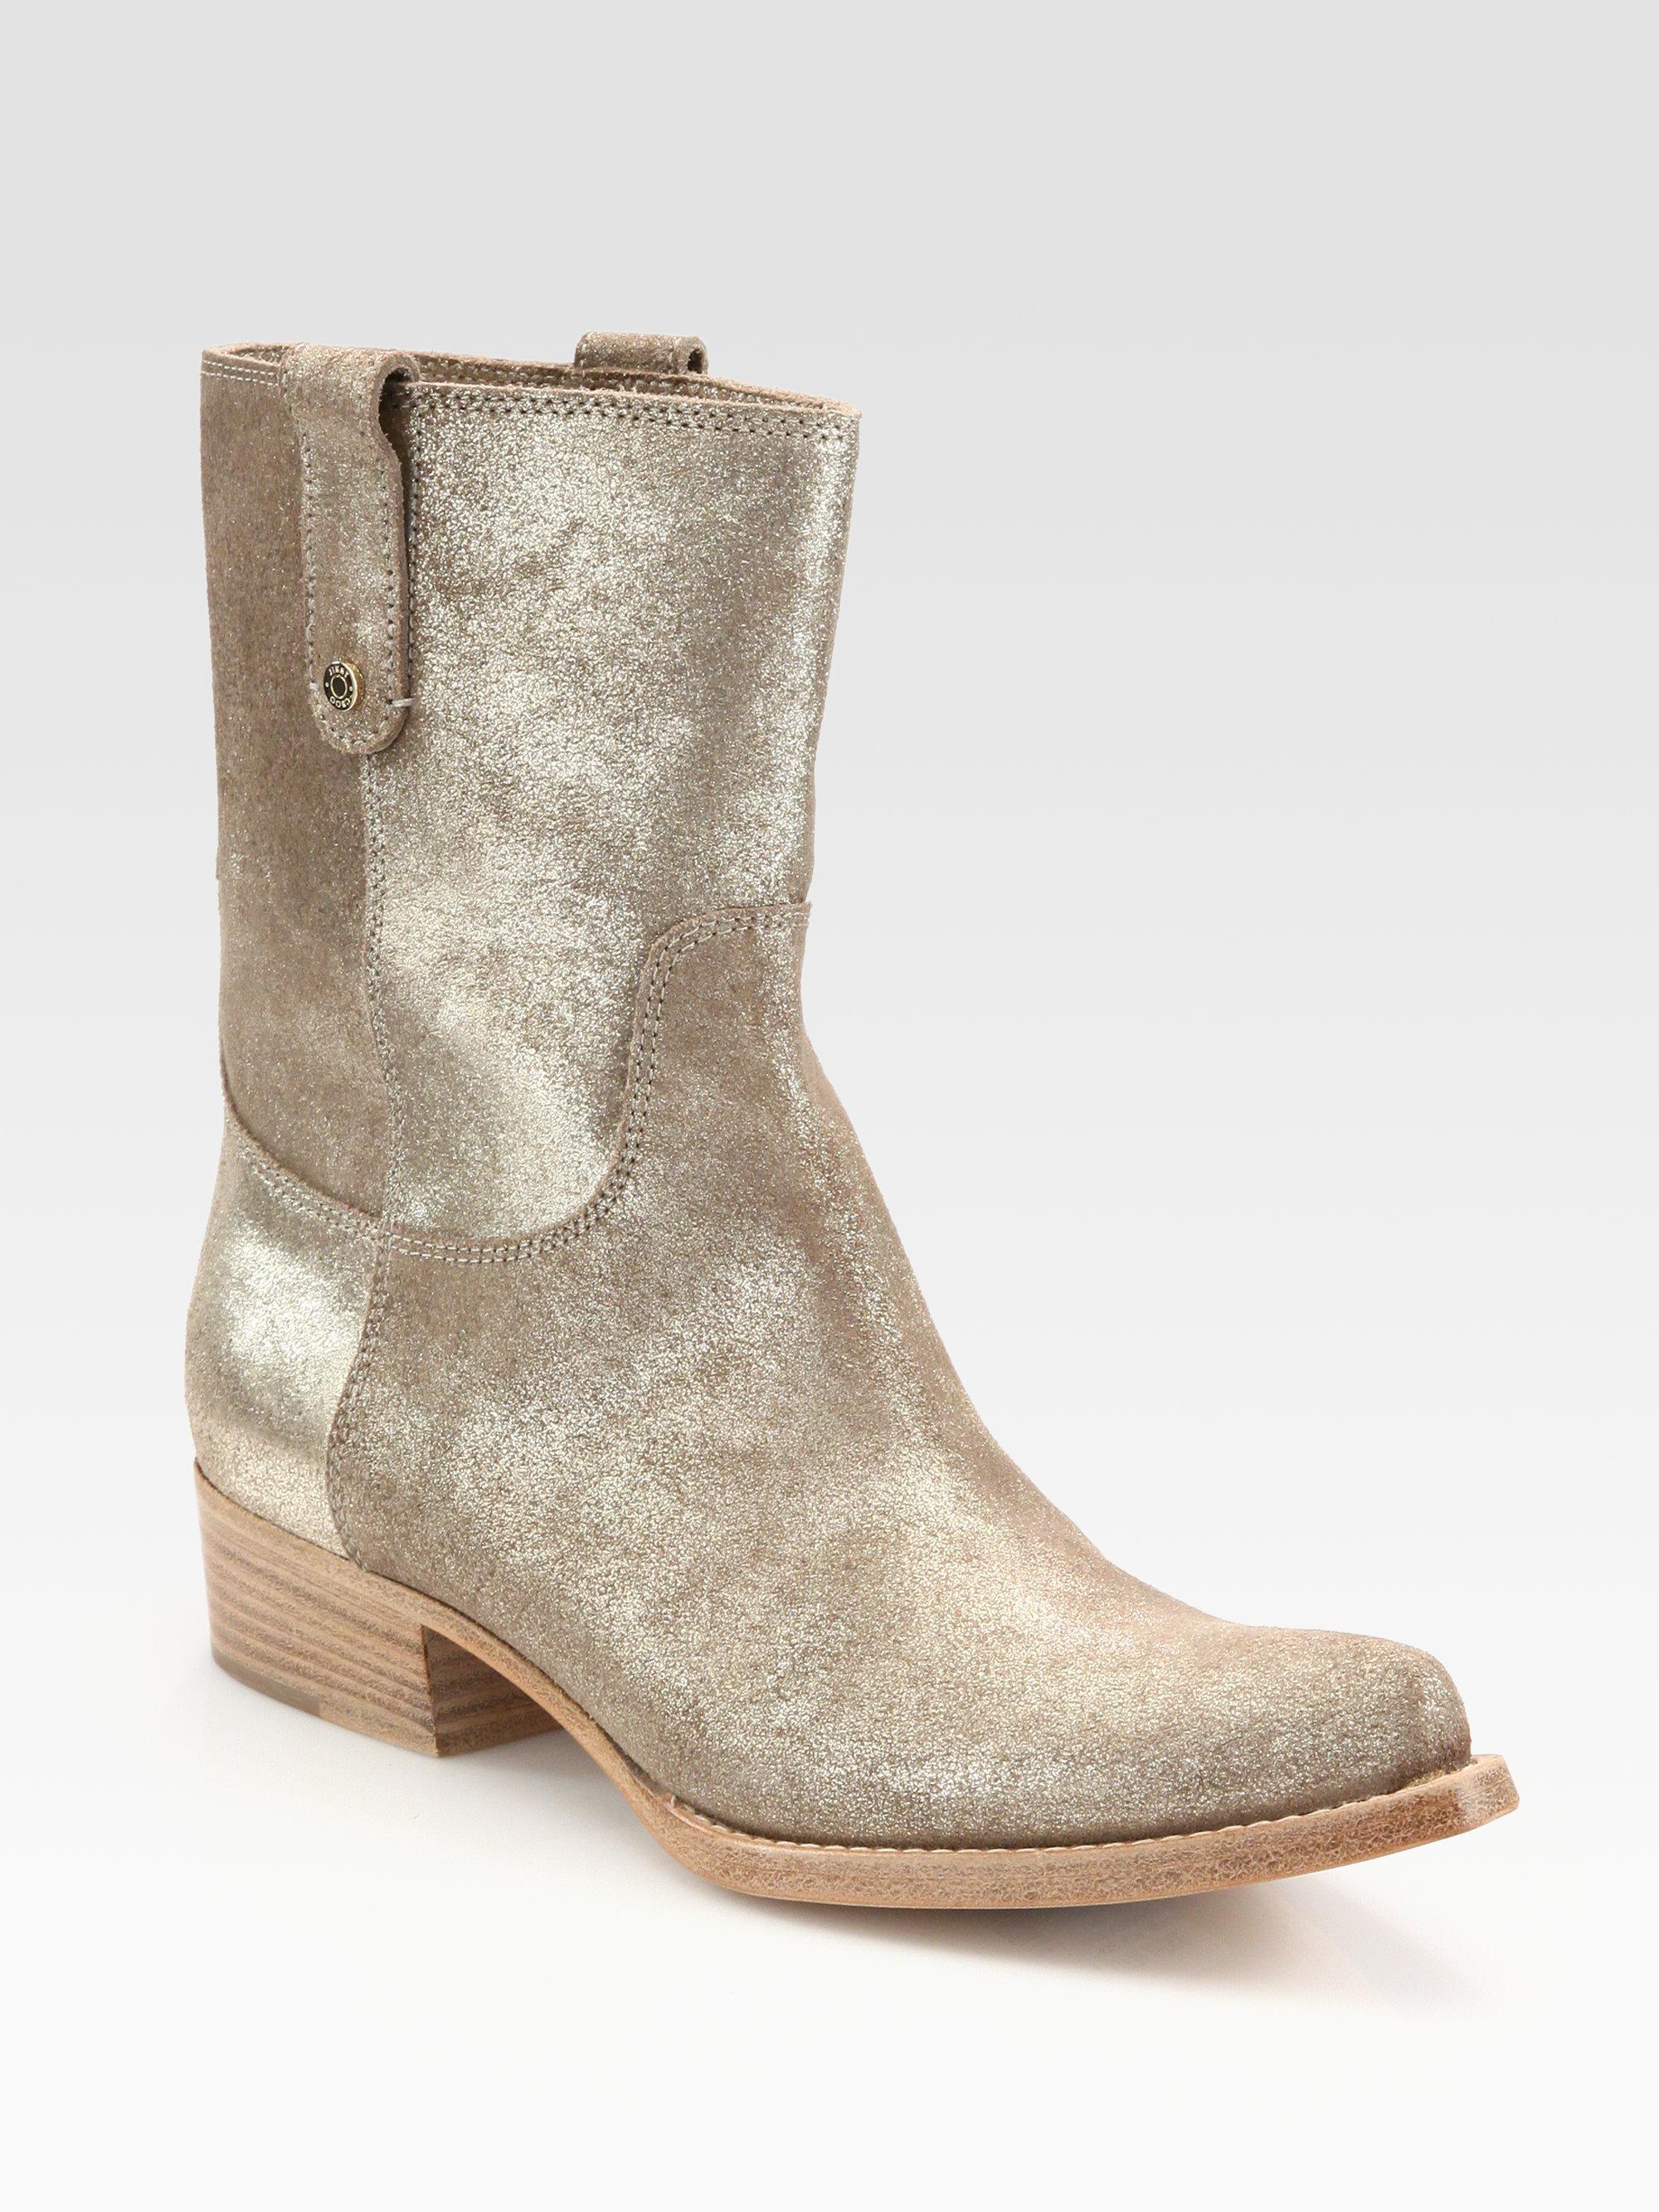 Jimmy choo Glitter Metallic Leather Cowboy Boots in Metallic | Lyst